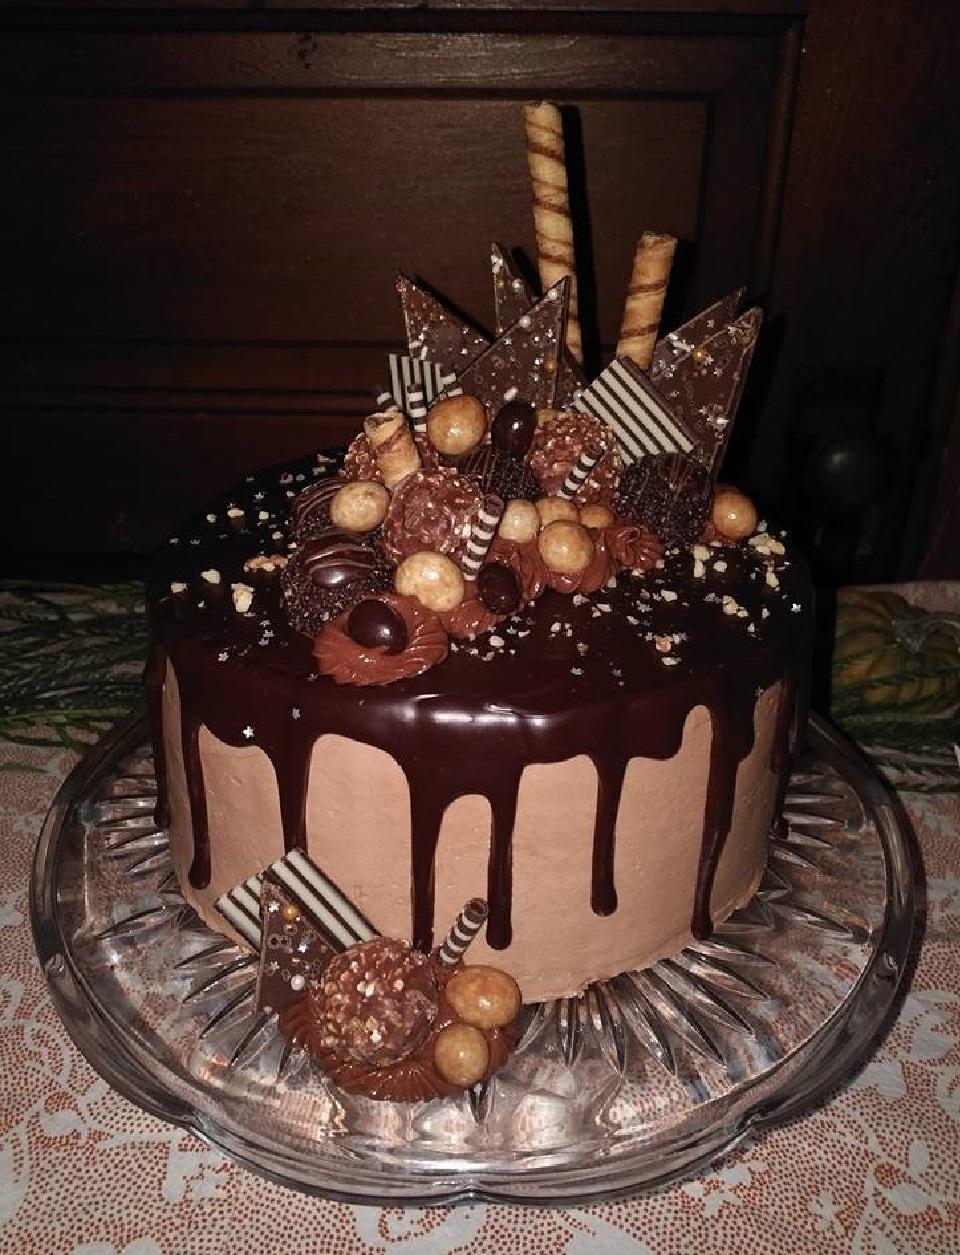 Remarkable Nutellareg Chocolate Cake Allrecipes Funny Birthday Cards Online Benoljebrpdamsfinfo